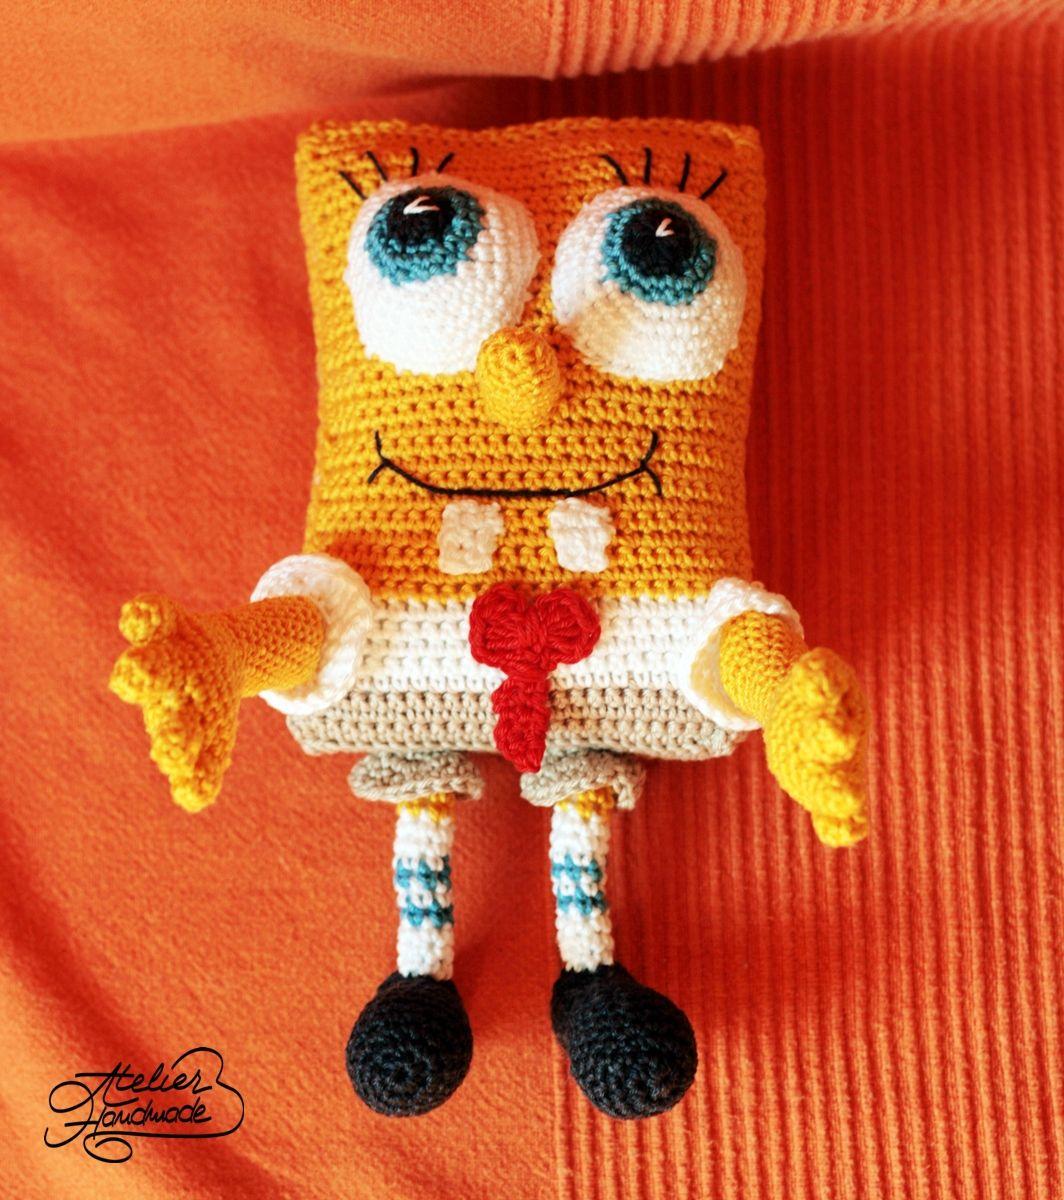 Amigurumi toy of cotton: crochet spongebob squarepants handmade ...